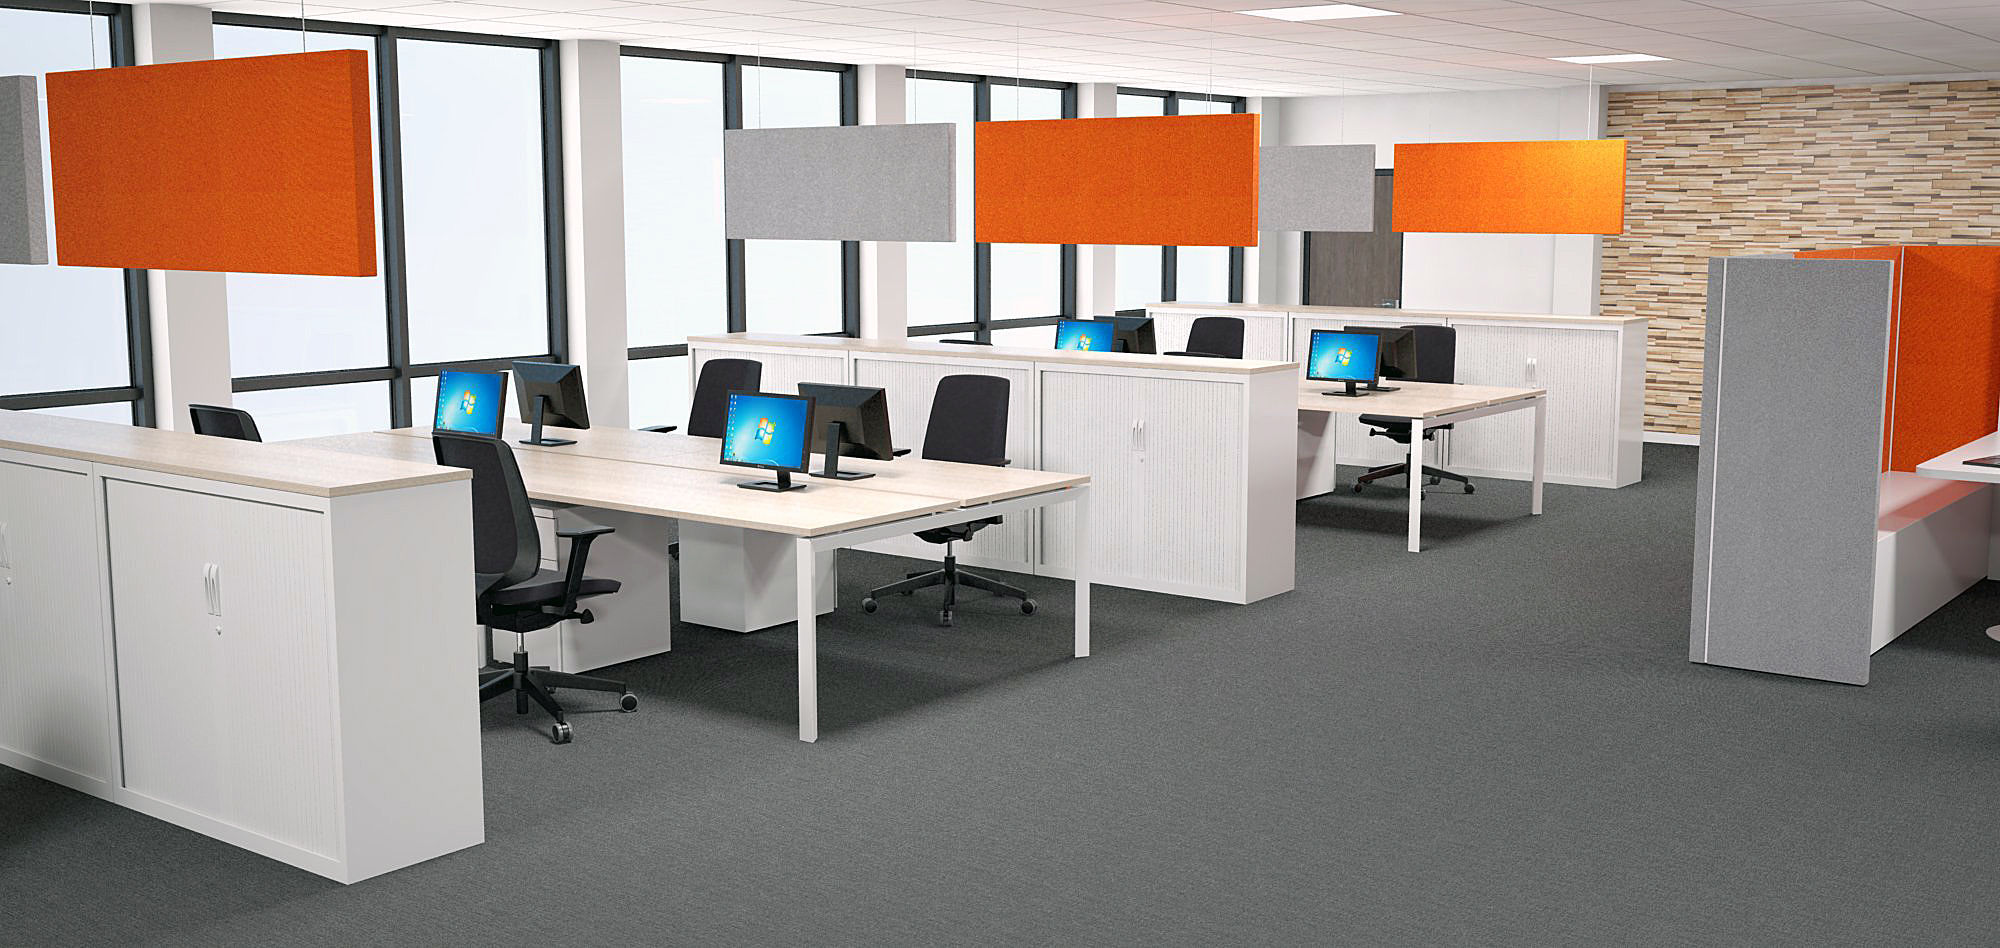 Relativ Hängende Trennwand / Stoff / Büro / Akustik - CAPSOUND - Espace HV75